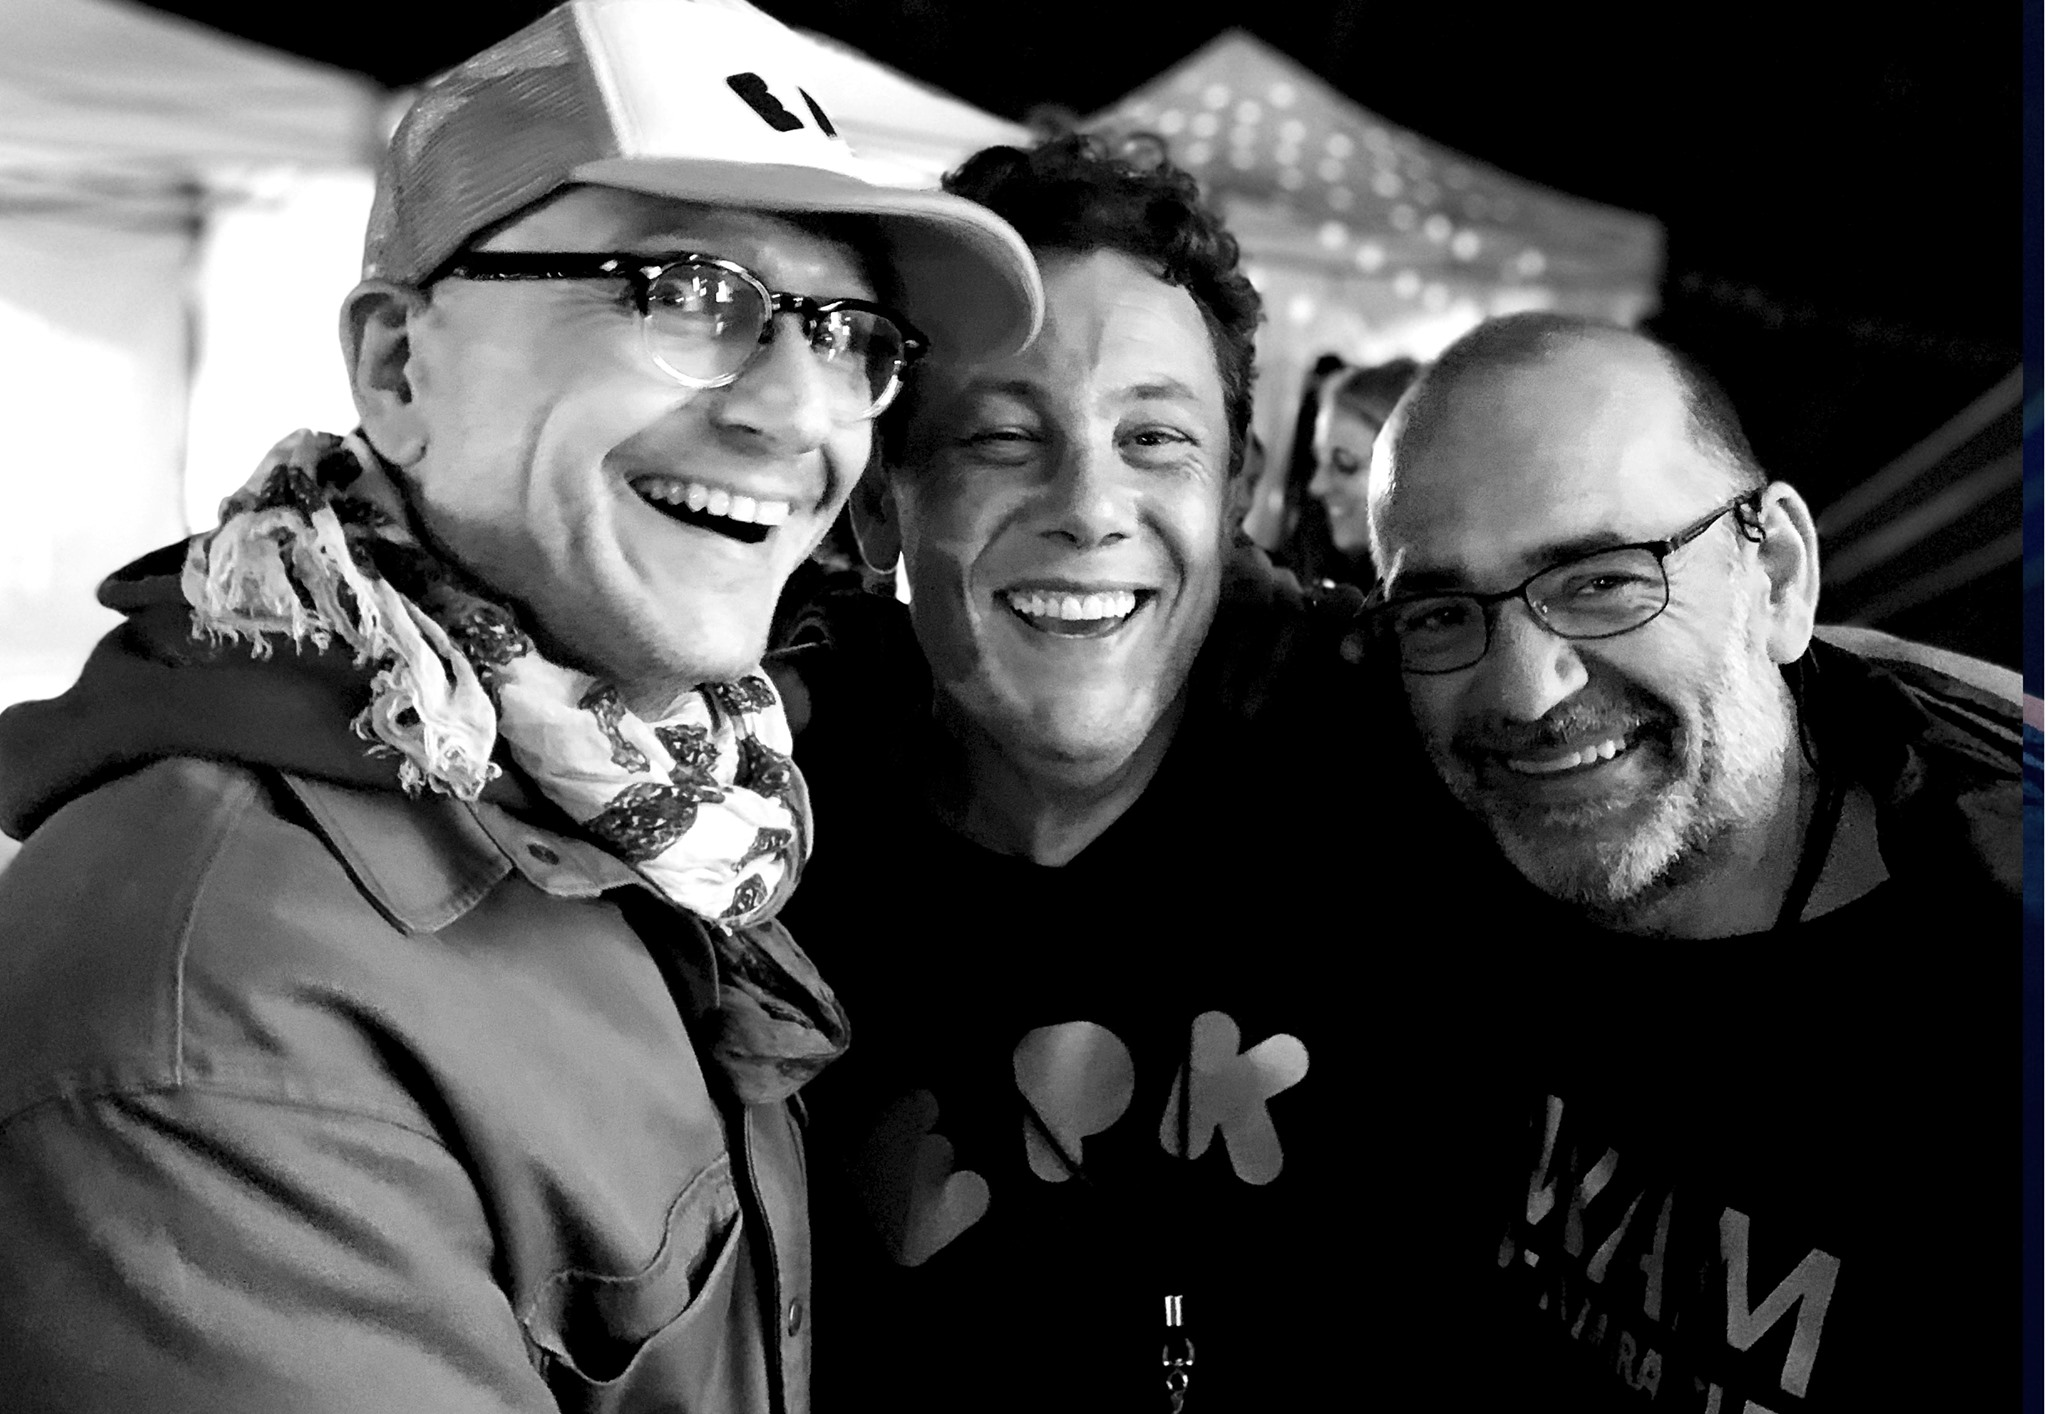 Joachim Garraud, Fabrice Revault, Cocto Herve laubeuf